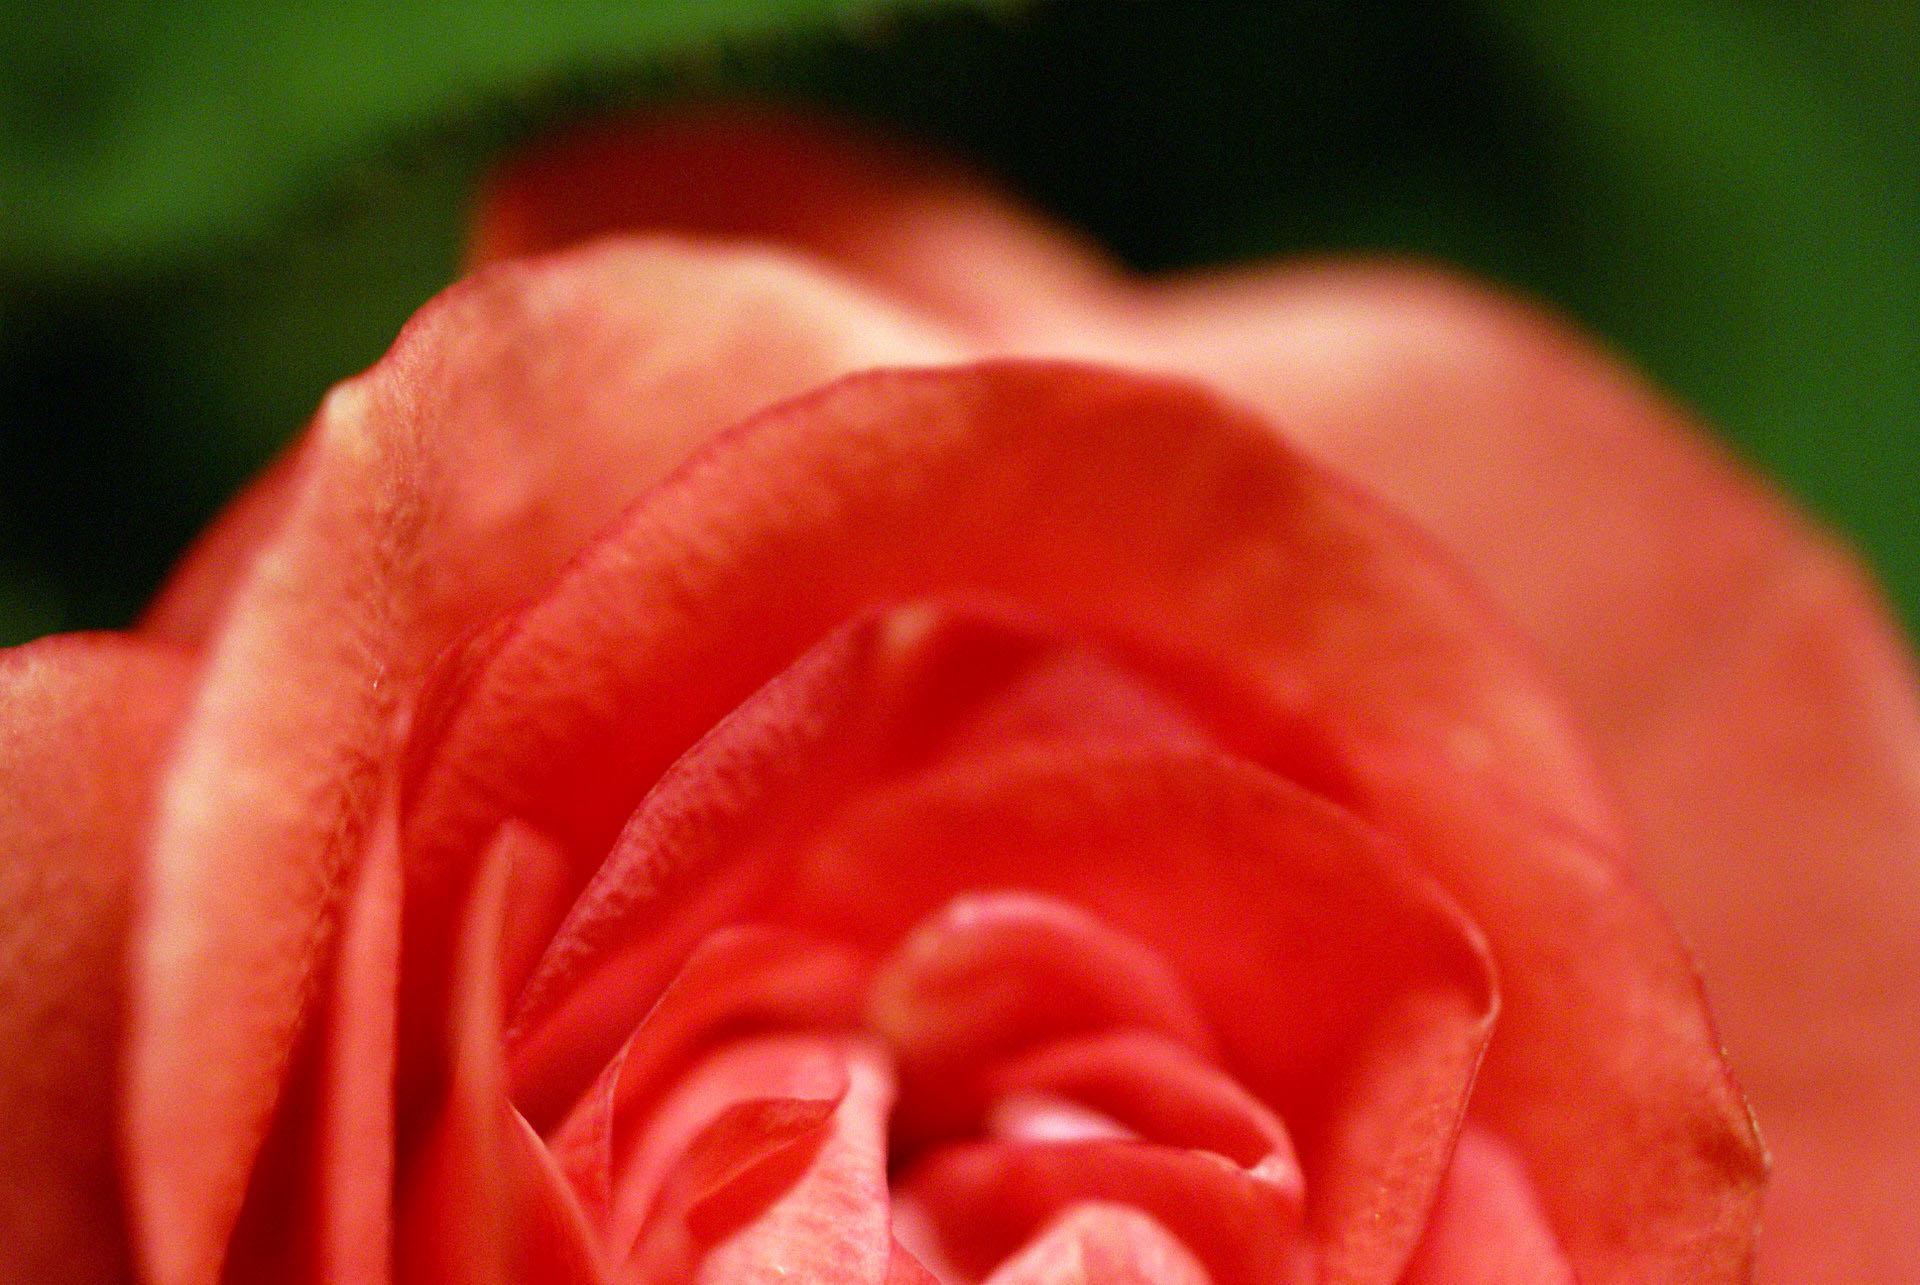 http://www.fabiovisentin.com/photography/photo/12/soft-rose.jpg